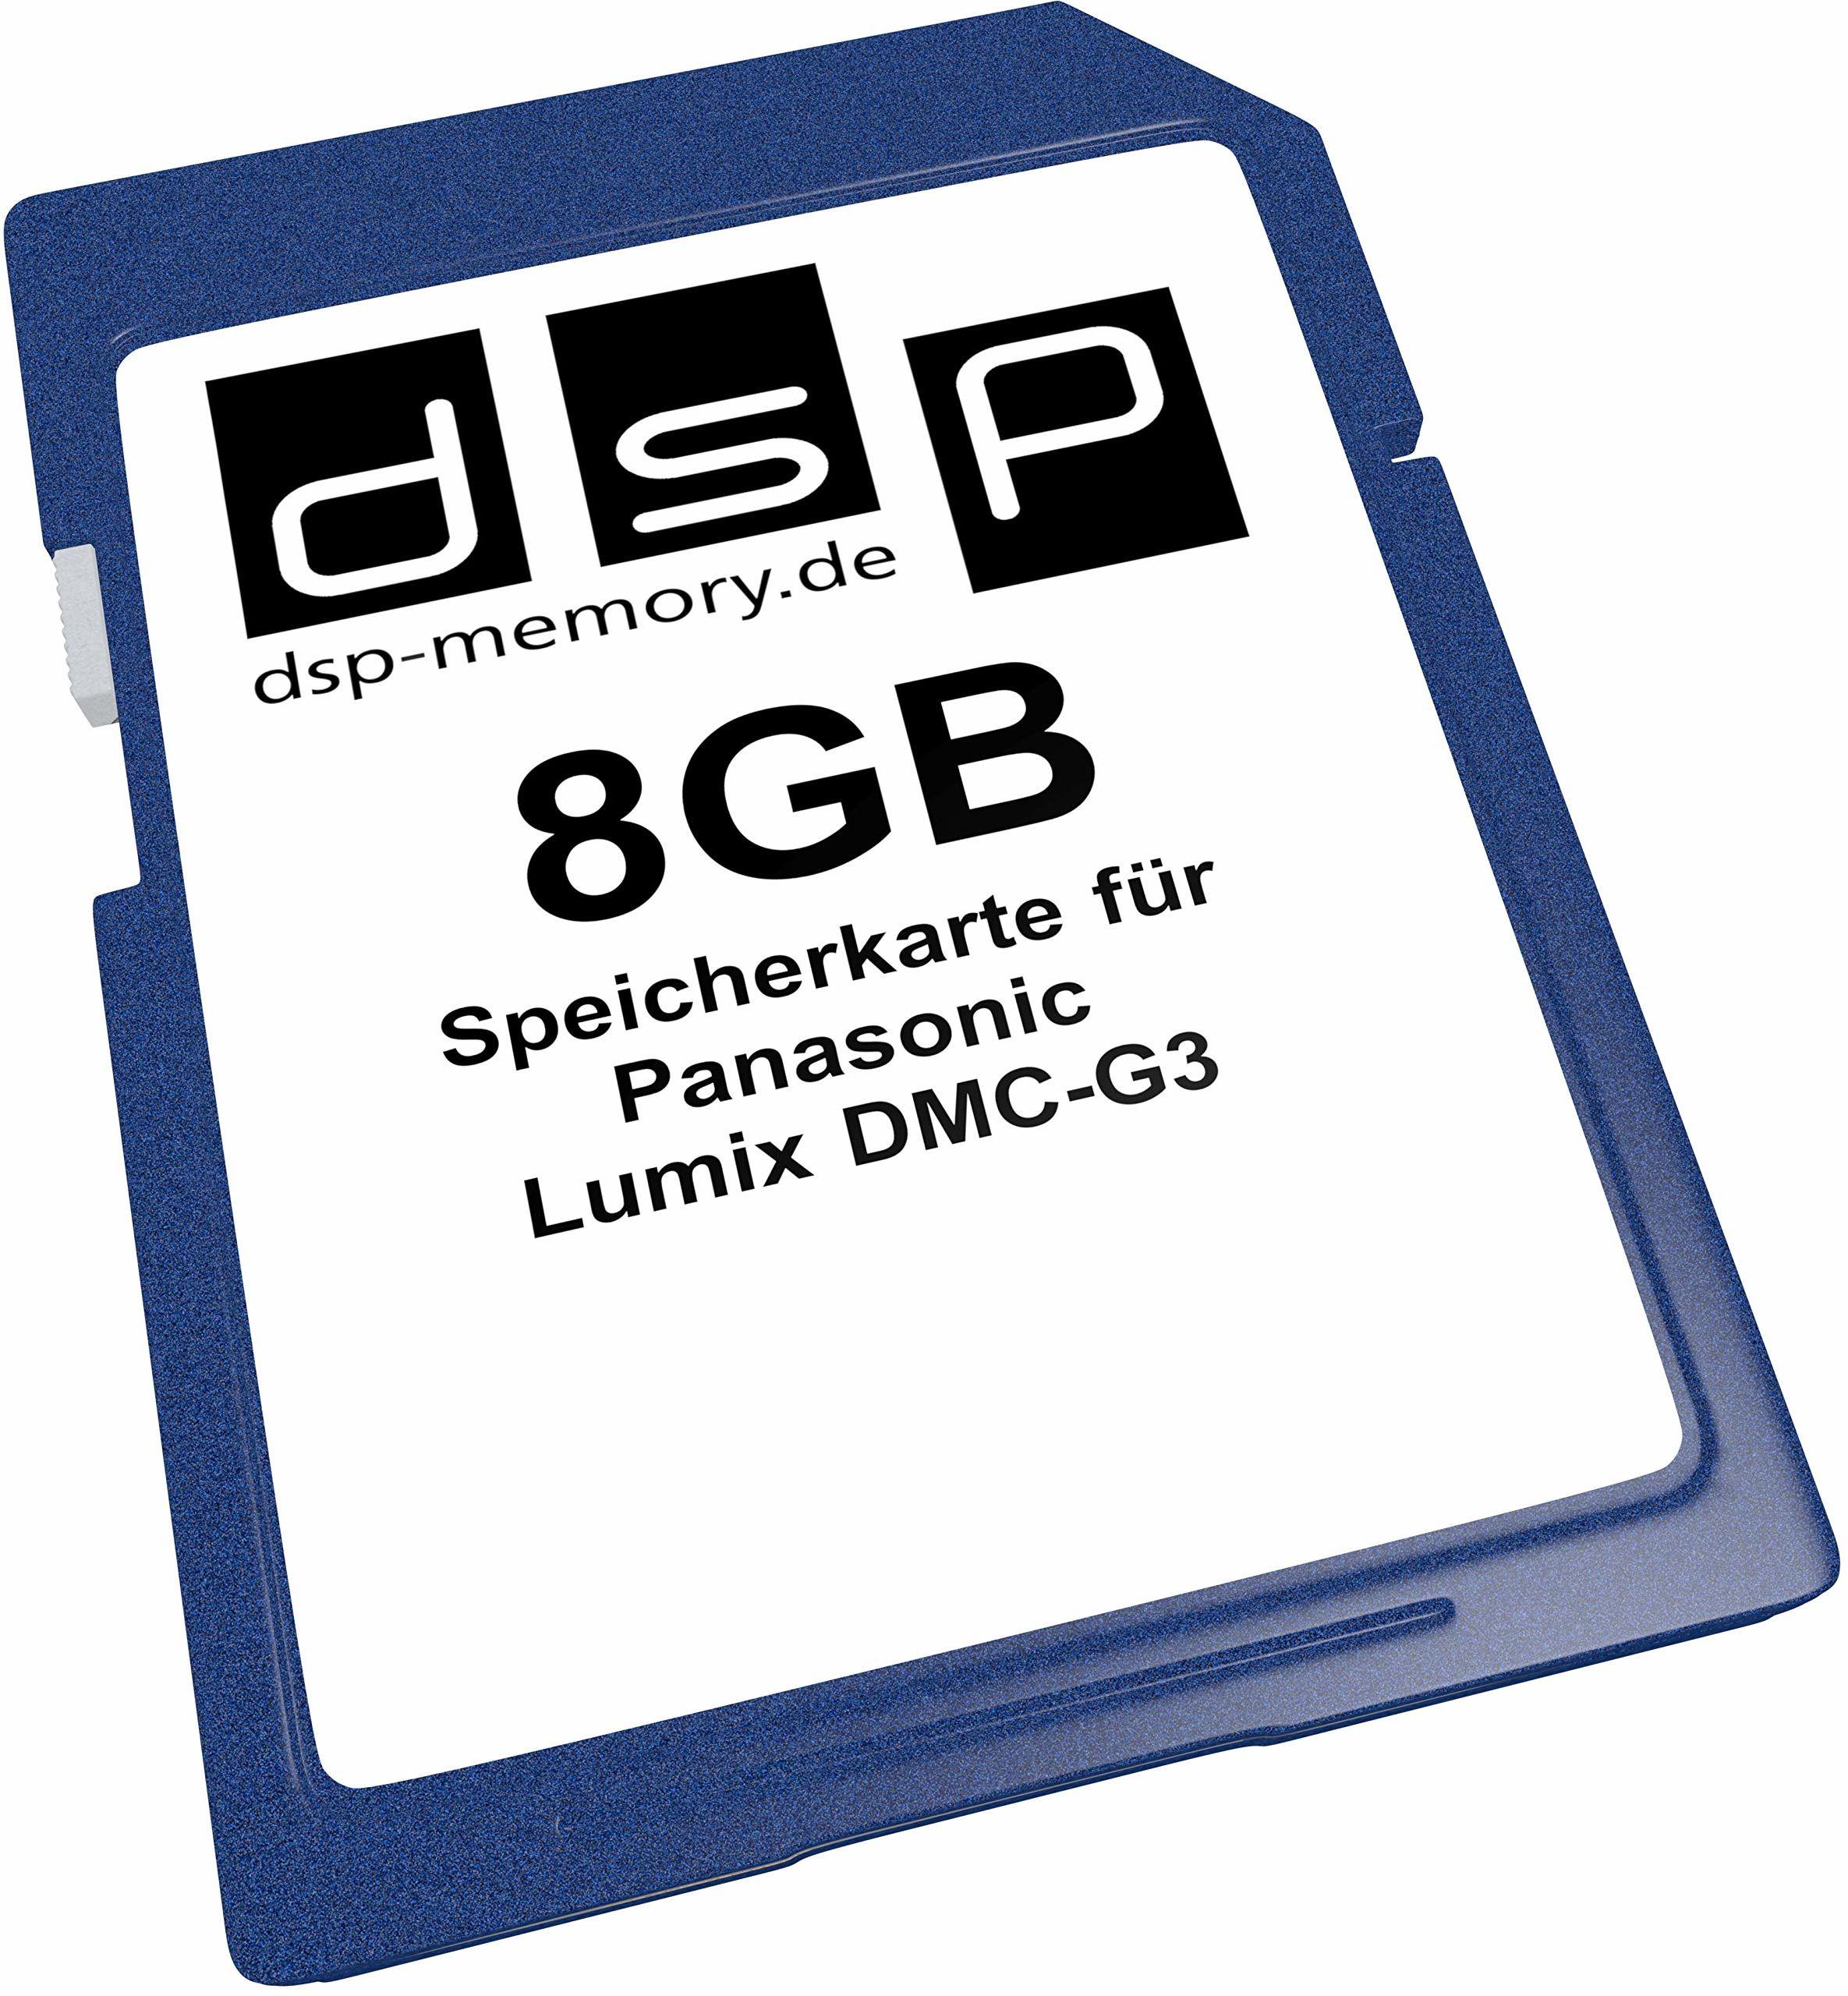 Karta pamięci 8 GB do Panasonic Lumix DMC-G3